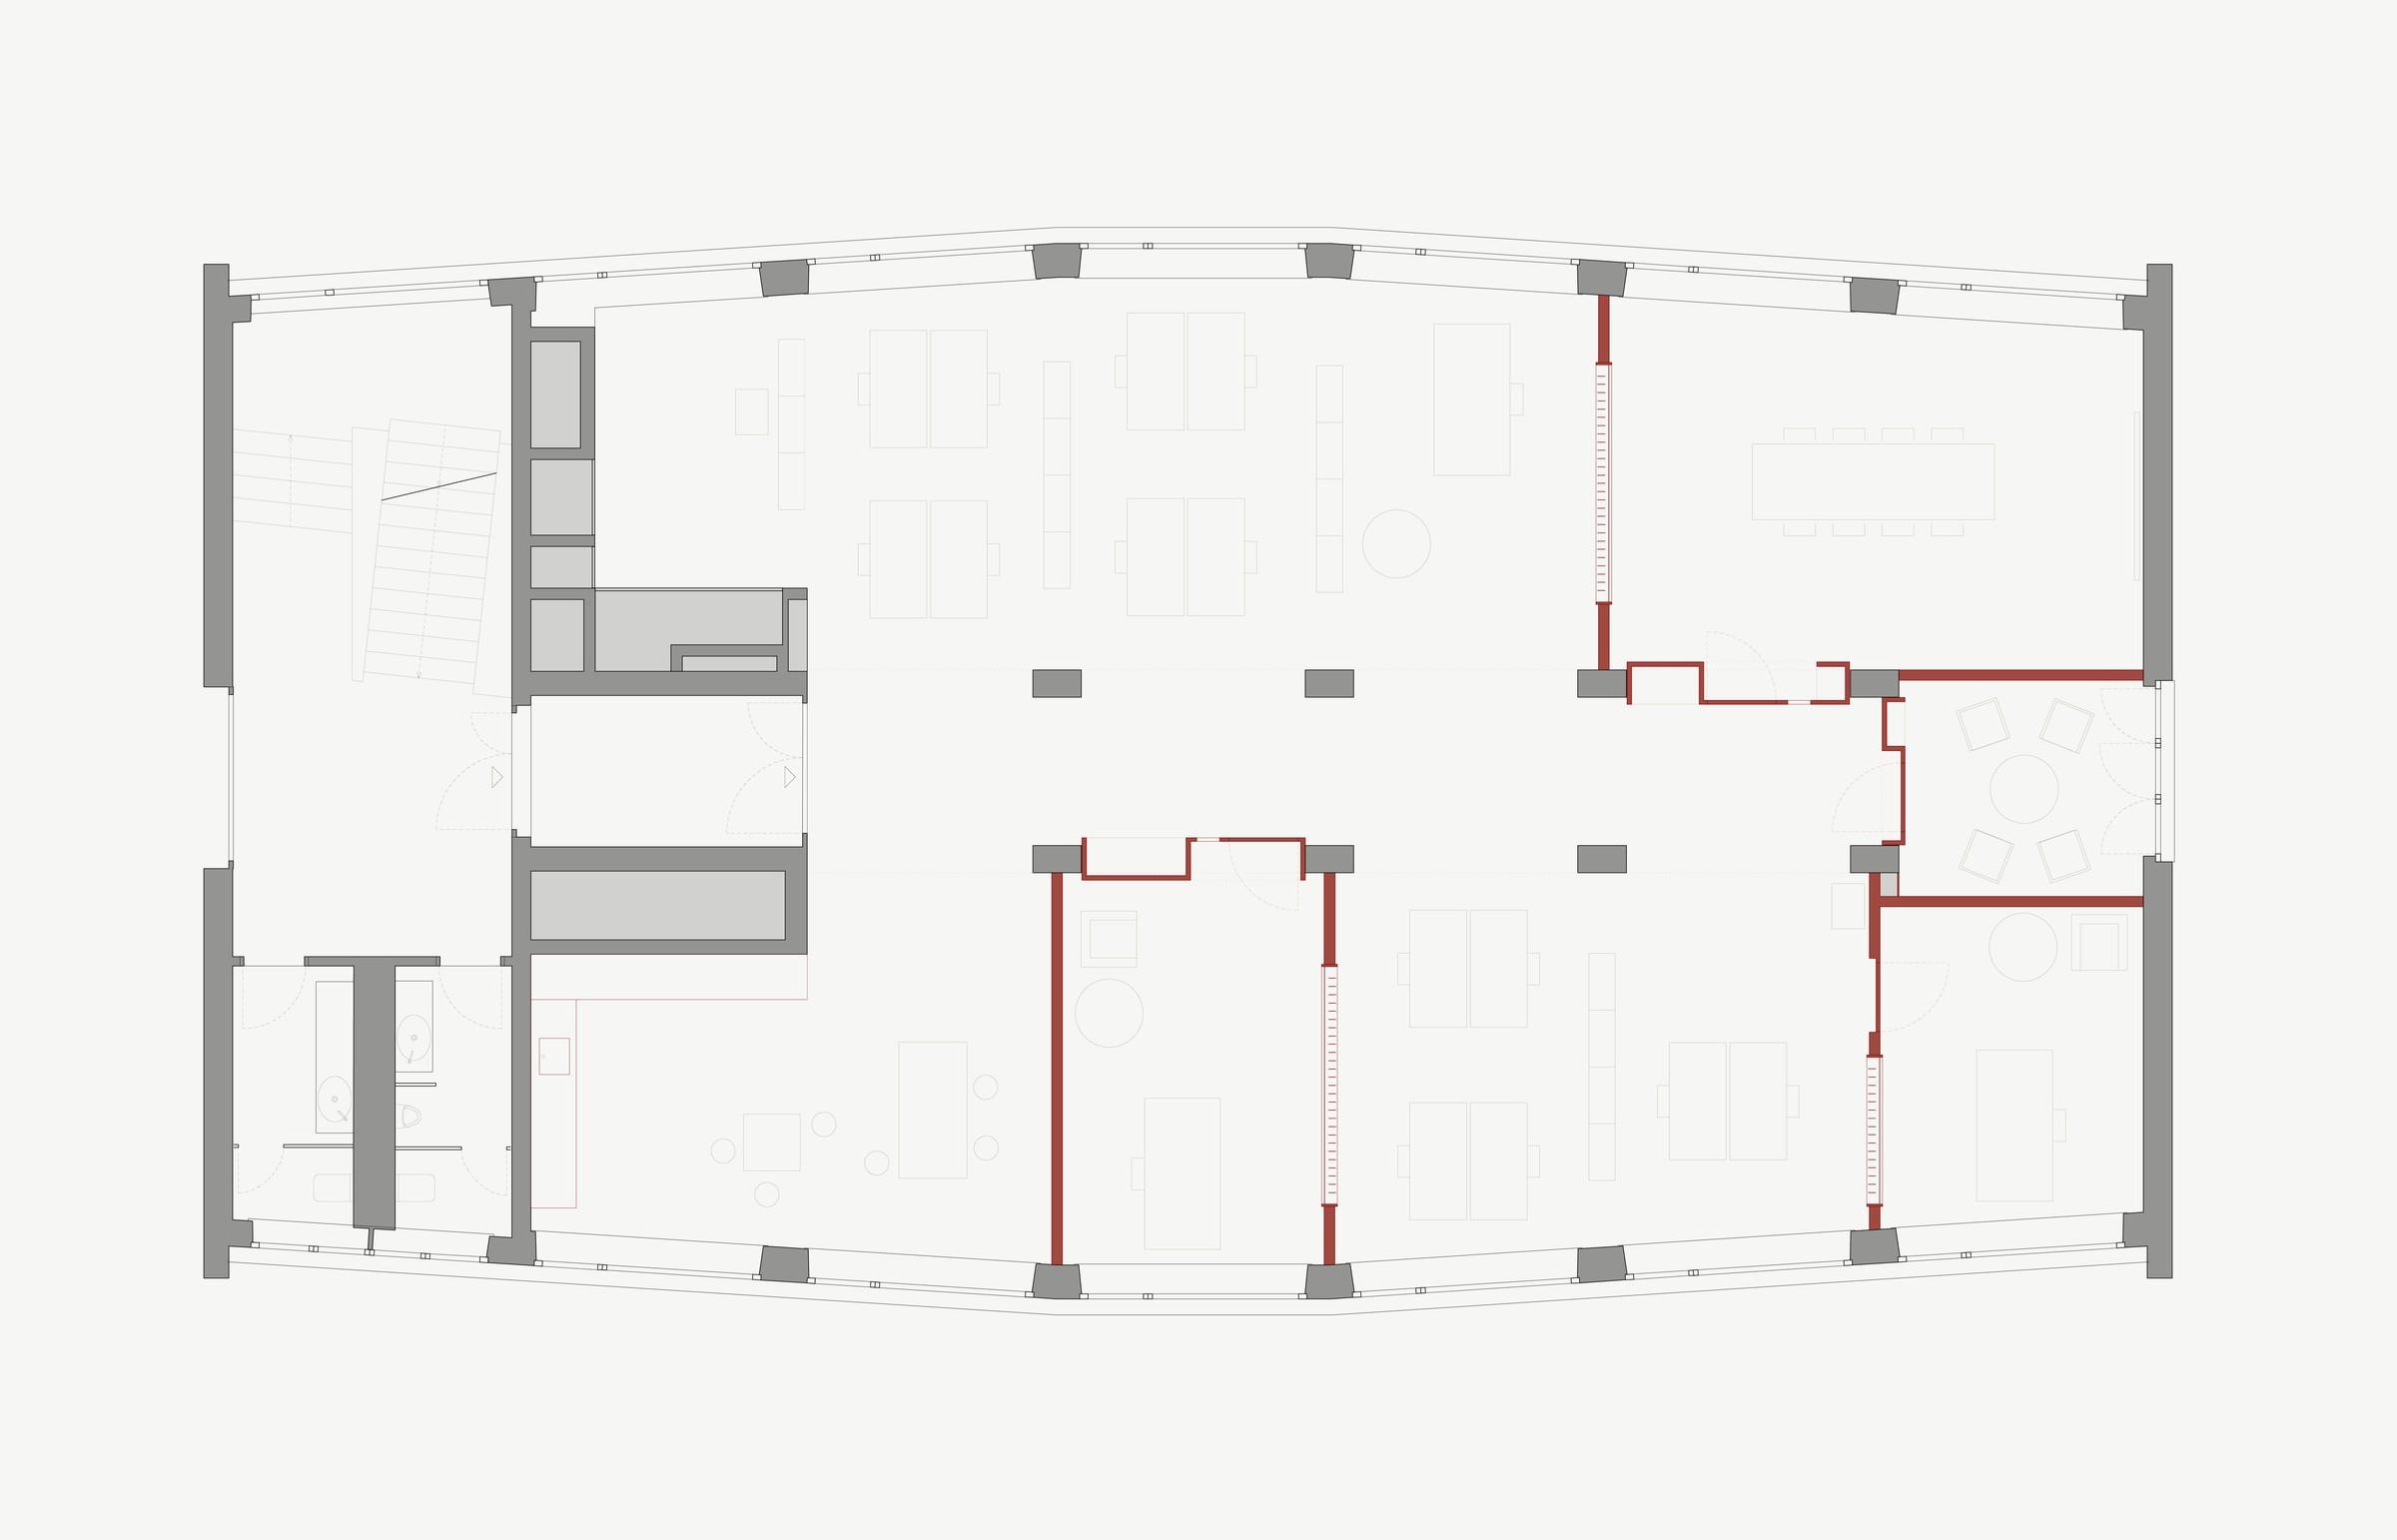 QNL_190411_K201-grundriss_web.jpg